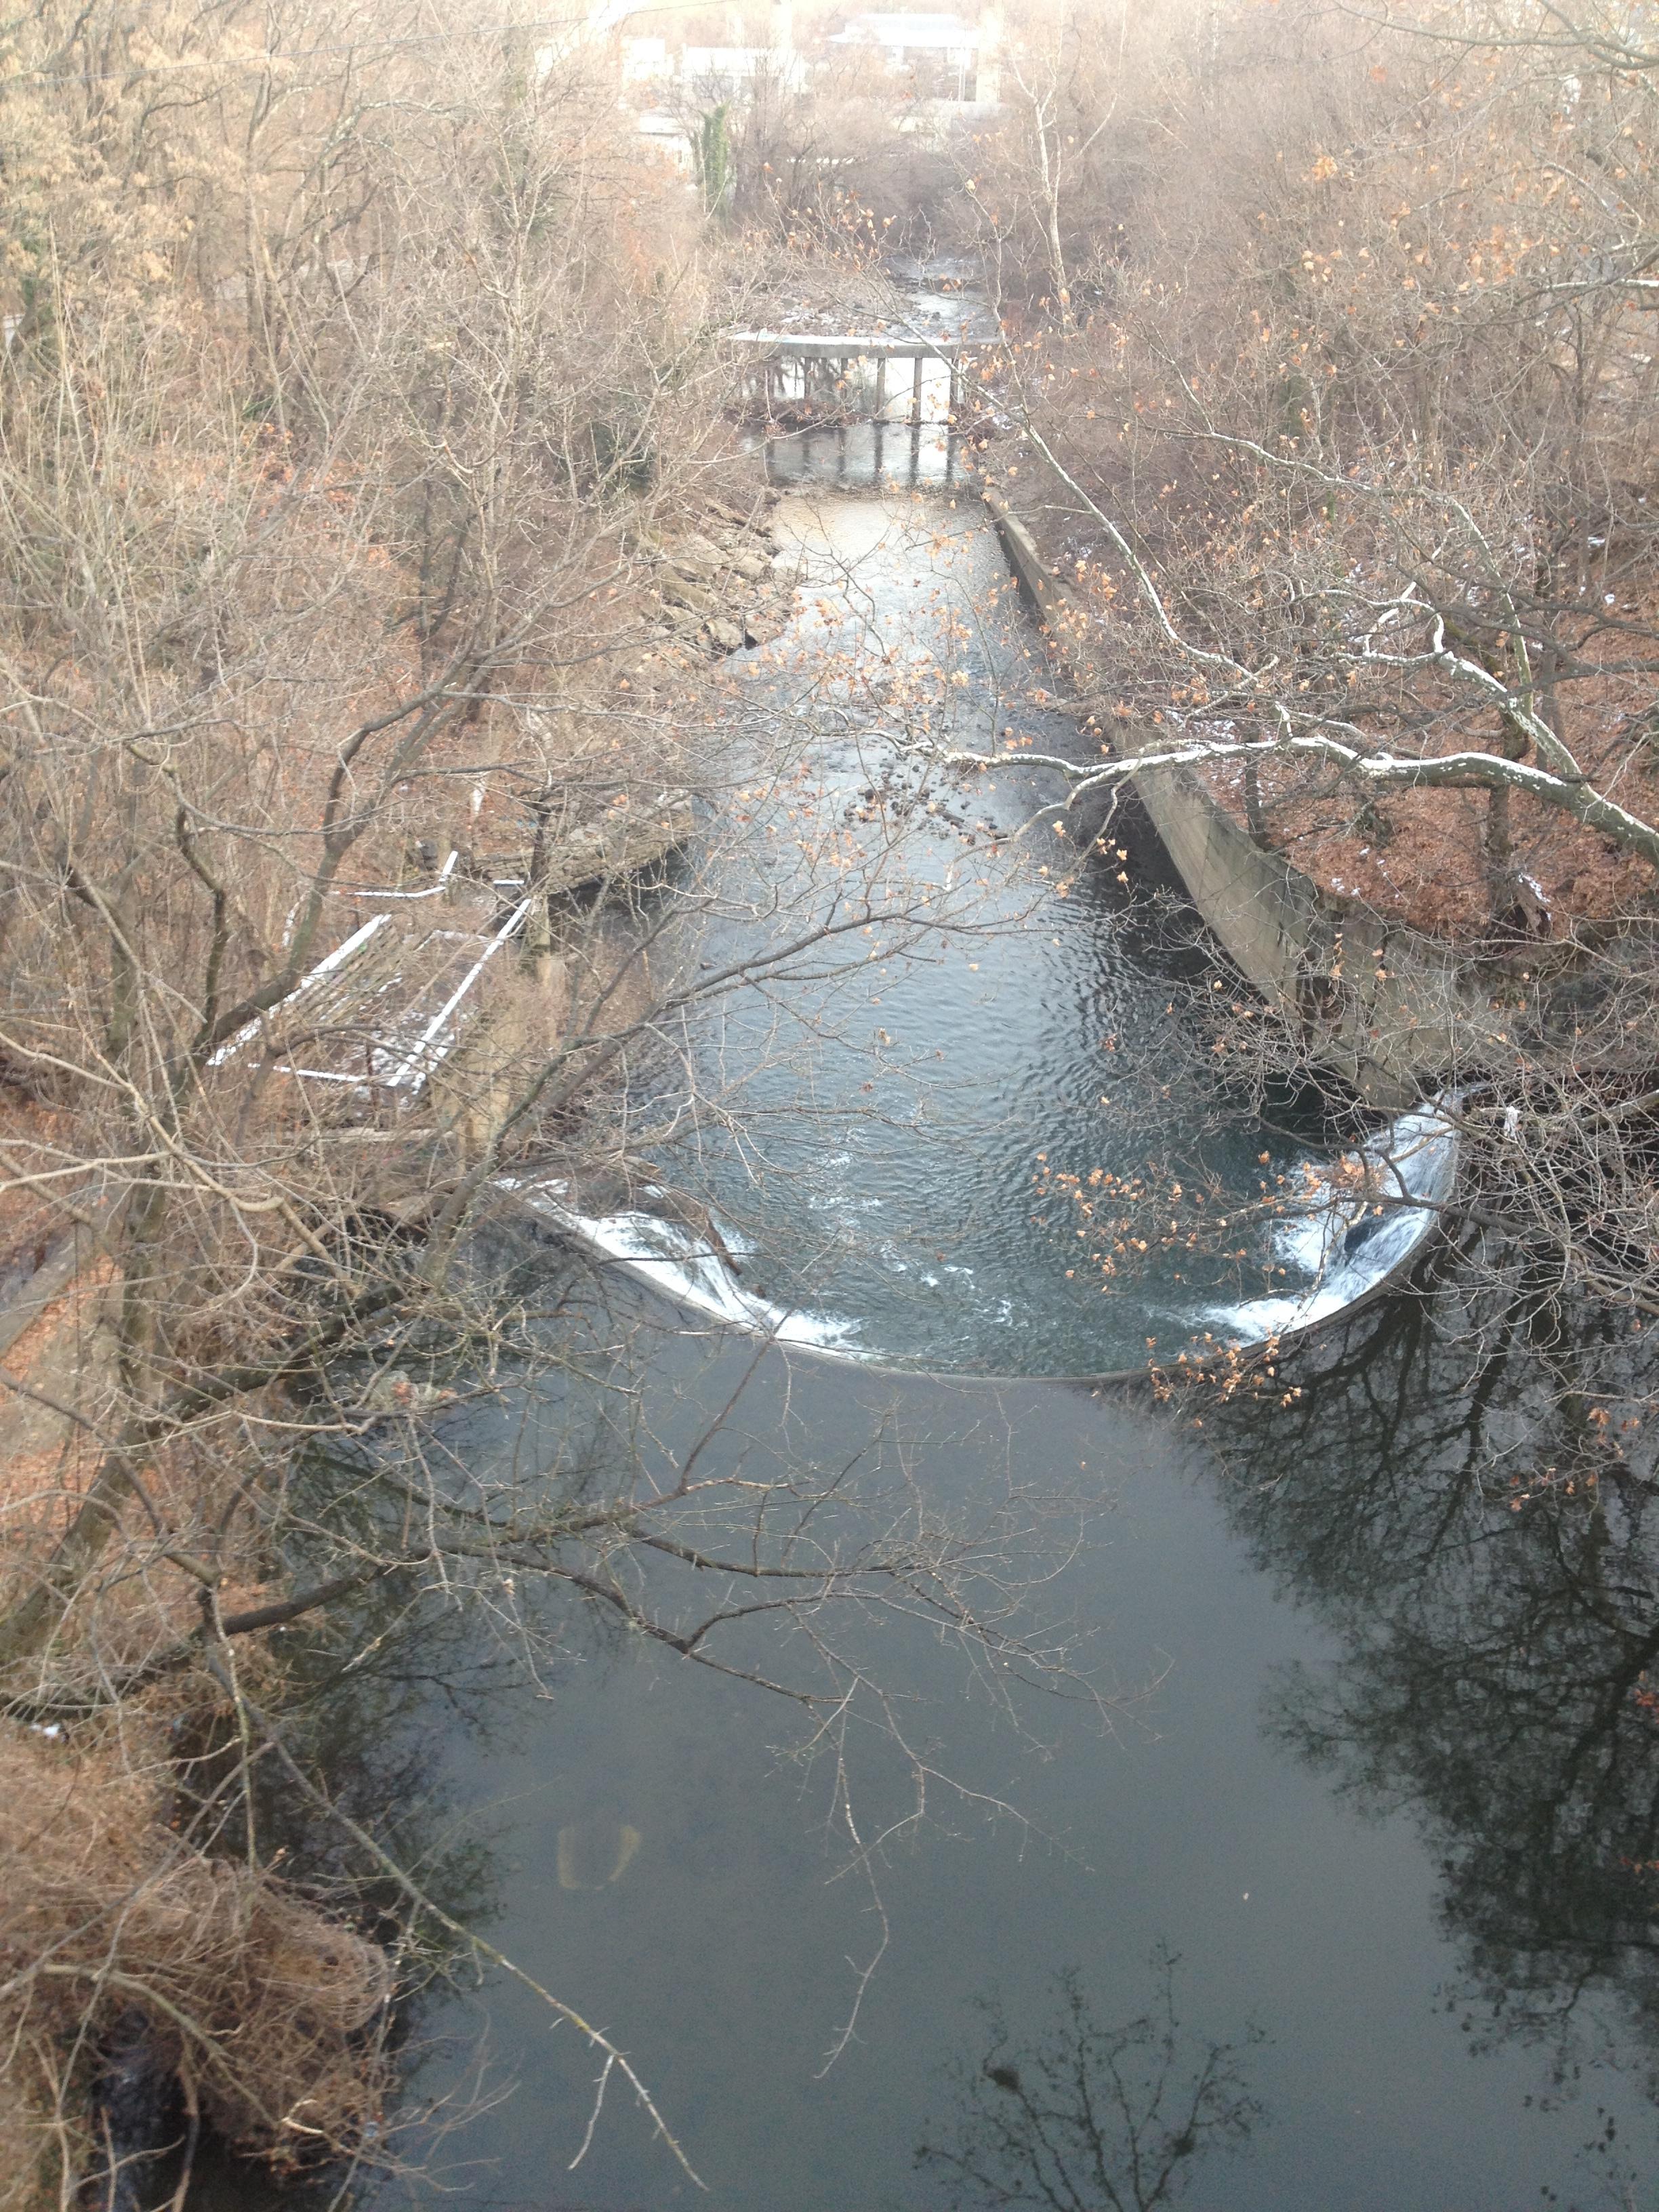 Jones Falls from above, taken from a bridge where few pedestrians dare tread.